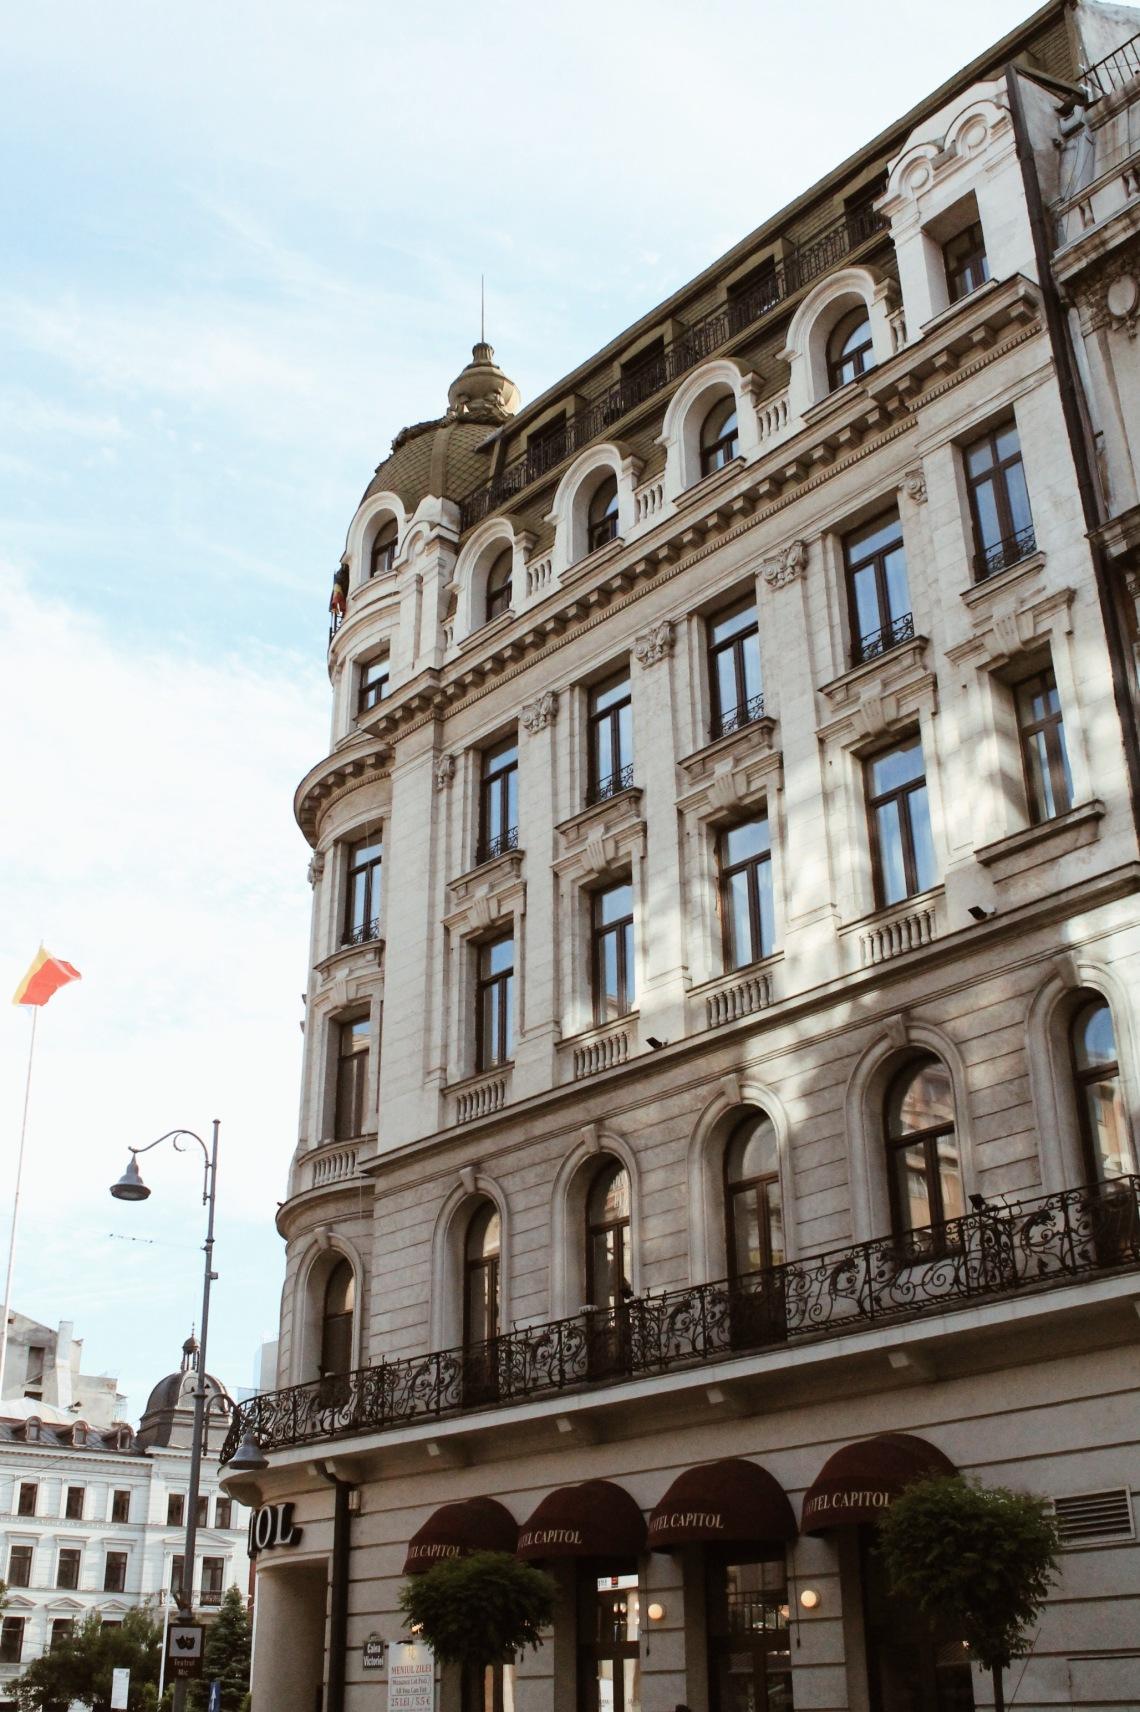 Capitol Hotel on Stirbei Palace on Victoriei Street (Calea Victoriei), Bucharest Romania